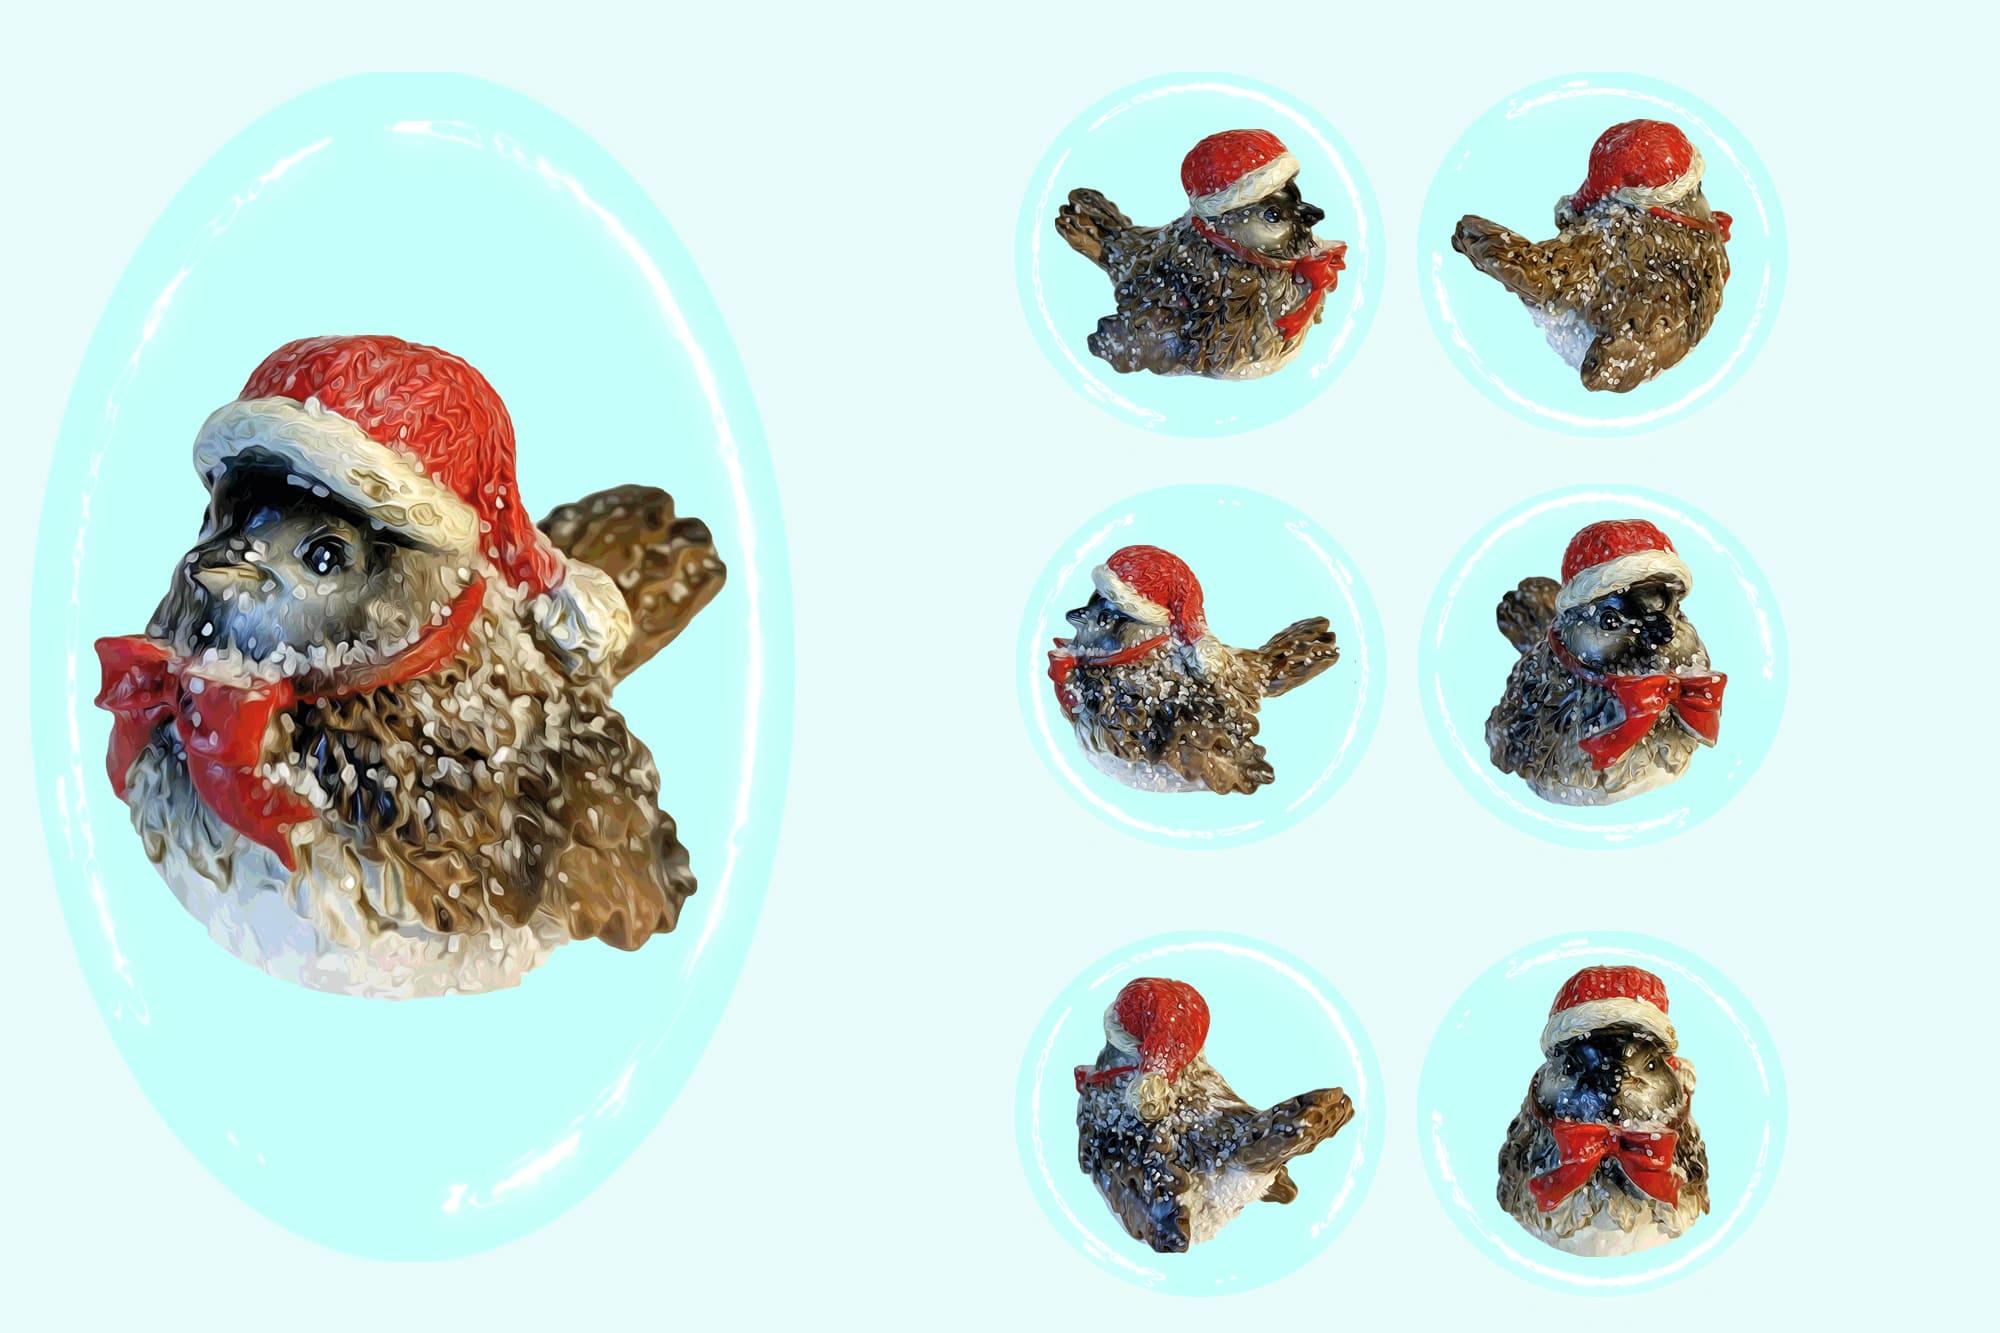 496 Christmas Illustrations: Christmas Vectors Bundle SVG, EPS, AI - Sparrow c